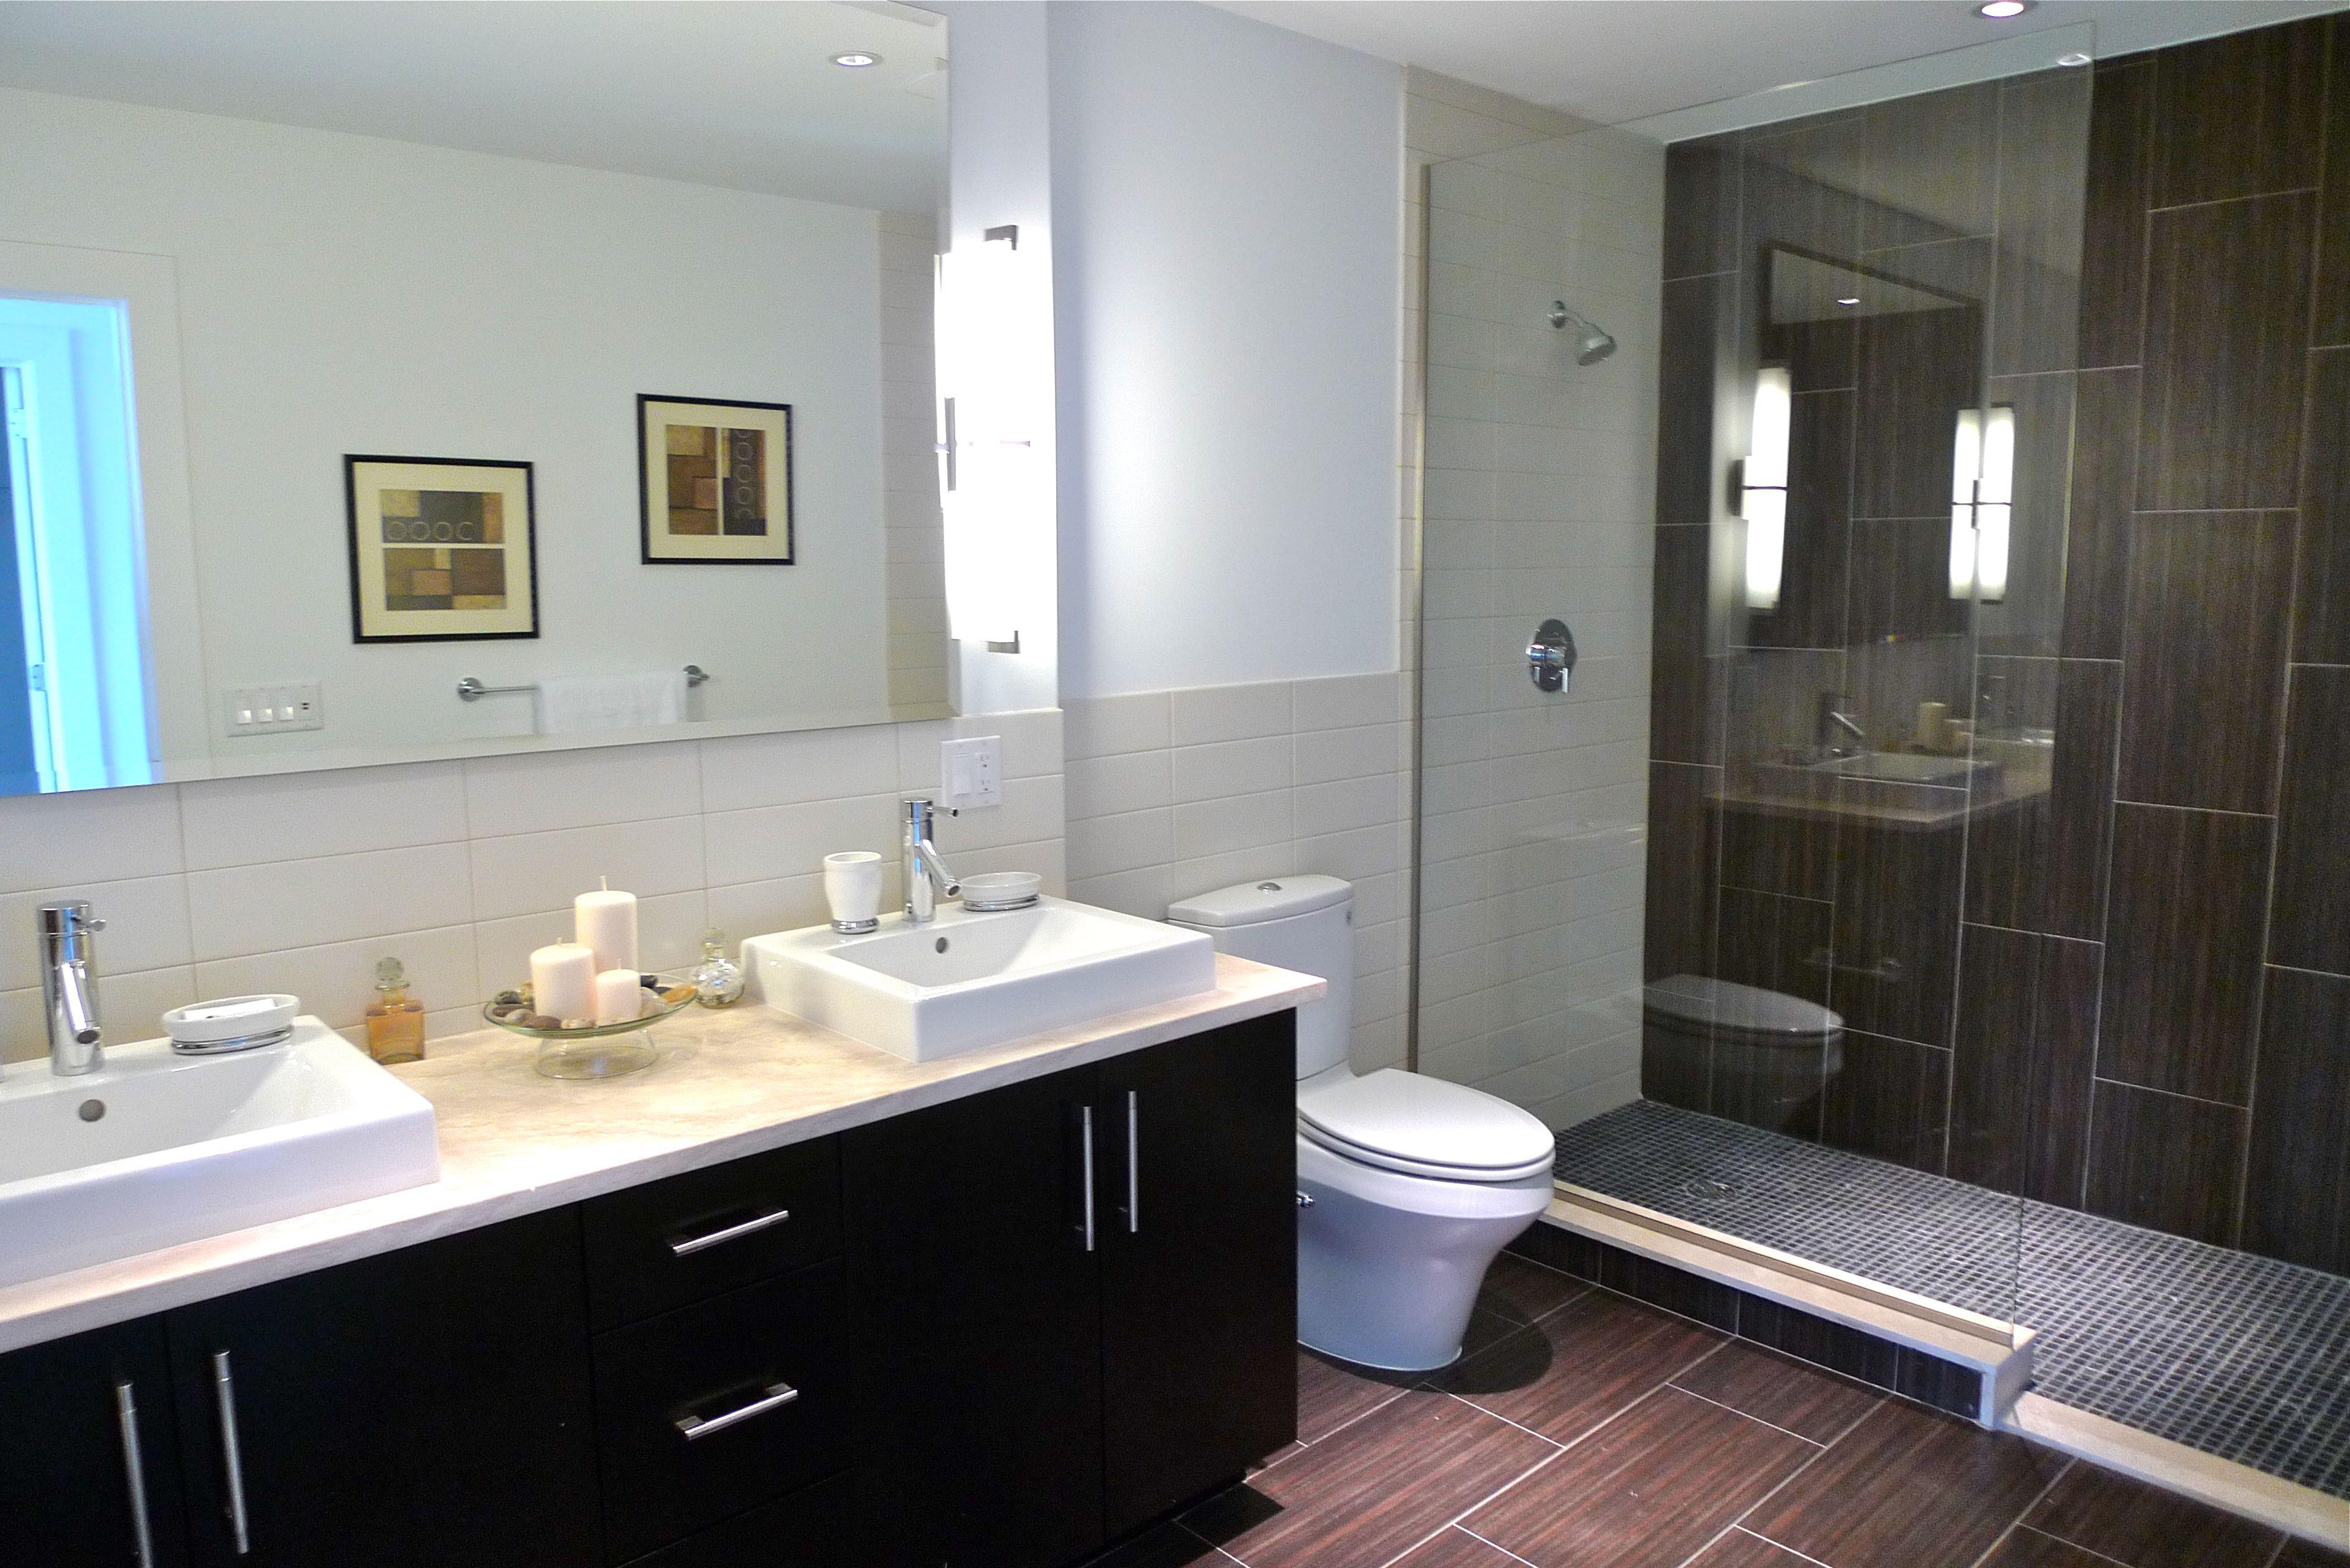 spa bathroom pictures photo - 4